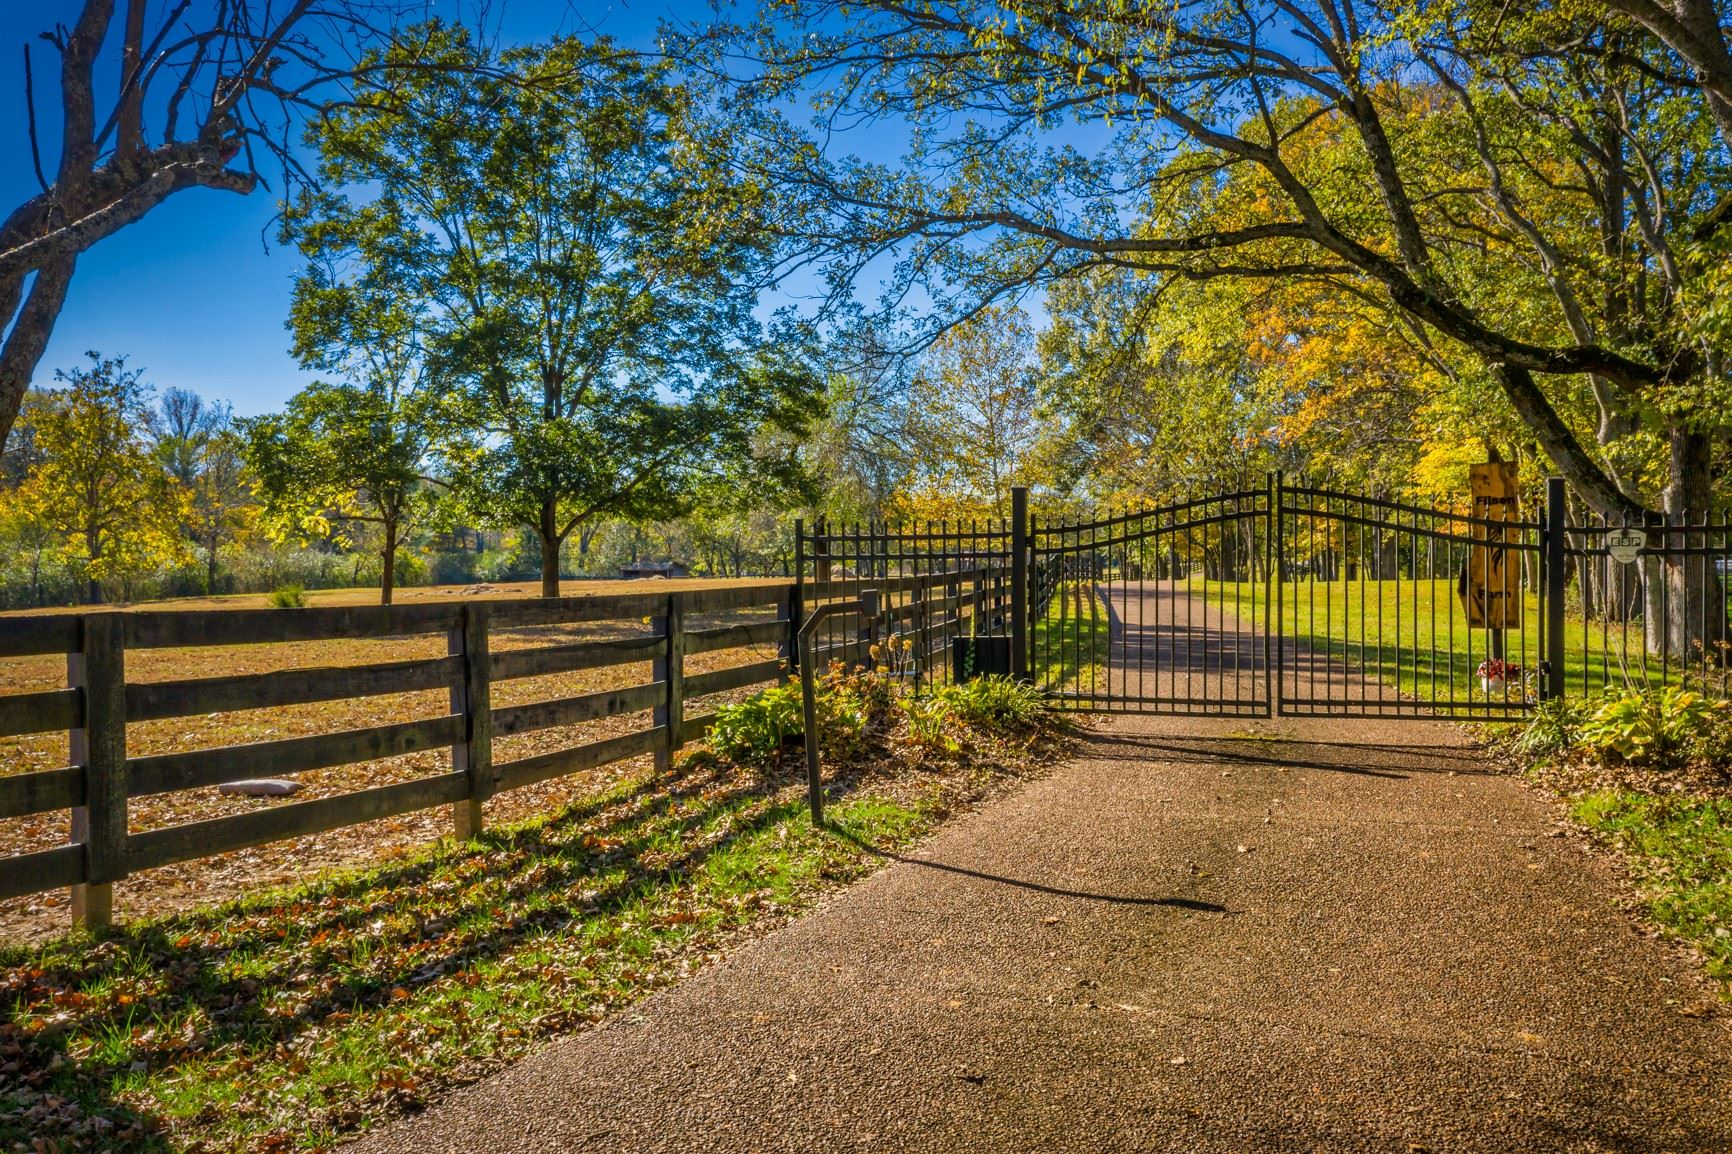 Photo of 2031 Maple Lane N, Franklin, TN 37067 (MLS # 2205020)